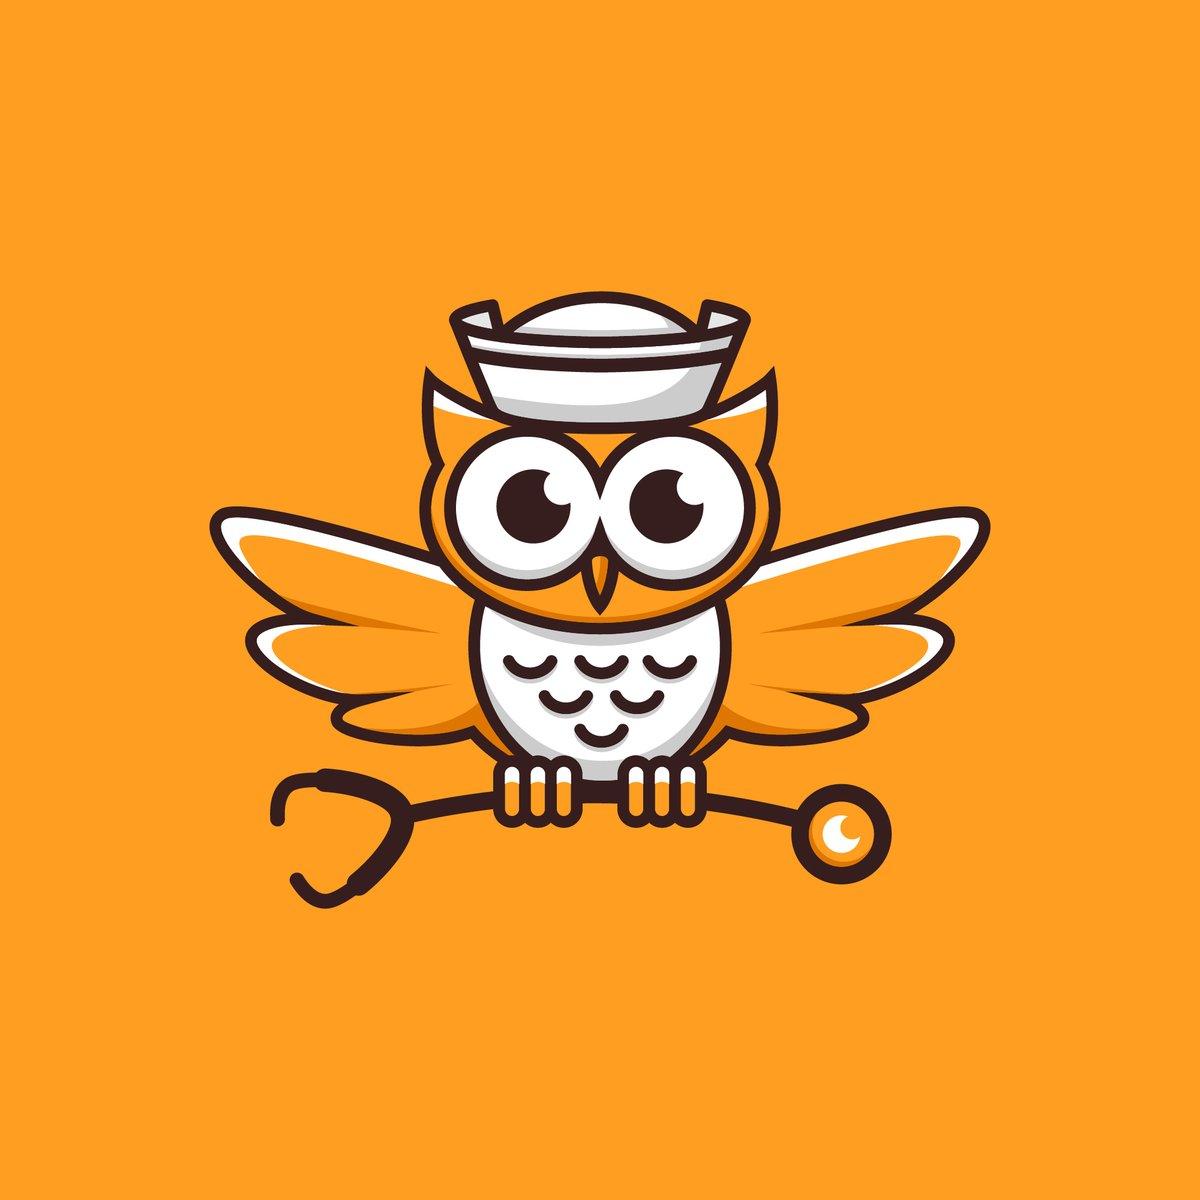 I'm Full time Logo Designer.! it's my fashion.✅ 🔎Do you need a logo designer??  👉Order Now : https://t.co/GvKCxu4r7x  #marketing #womenwhoCode #design #JK #100DaysOfCode #manhattan #jamesblake #rickandmorty #thebabysitter #getupdc #USA #nflvotes #logo_designer #need_logo #logo https://t.co/rwisMofYou